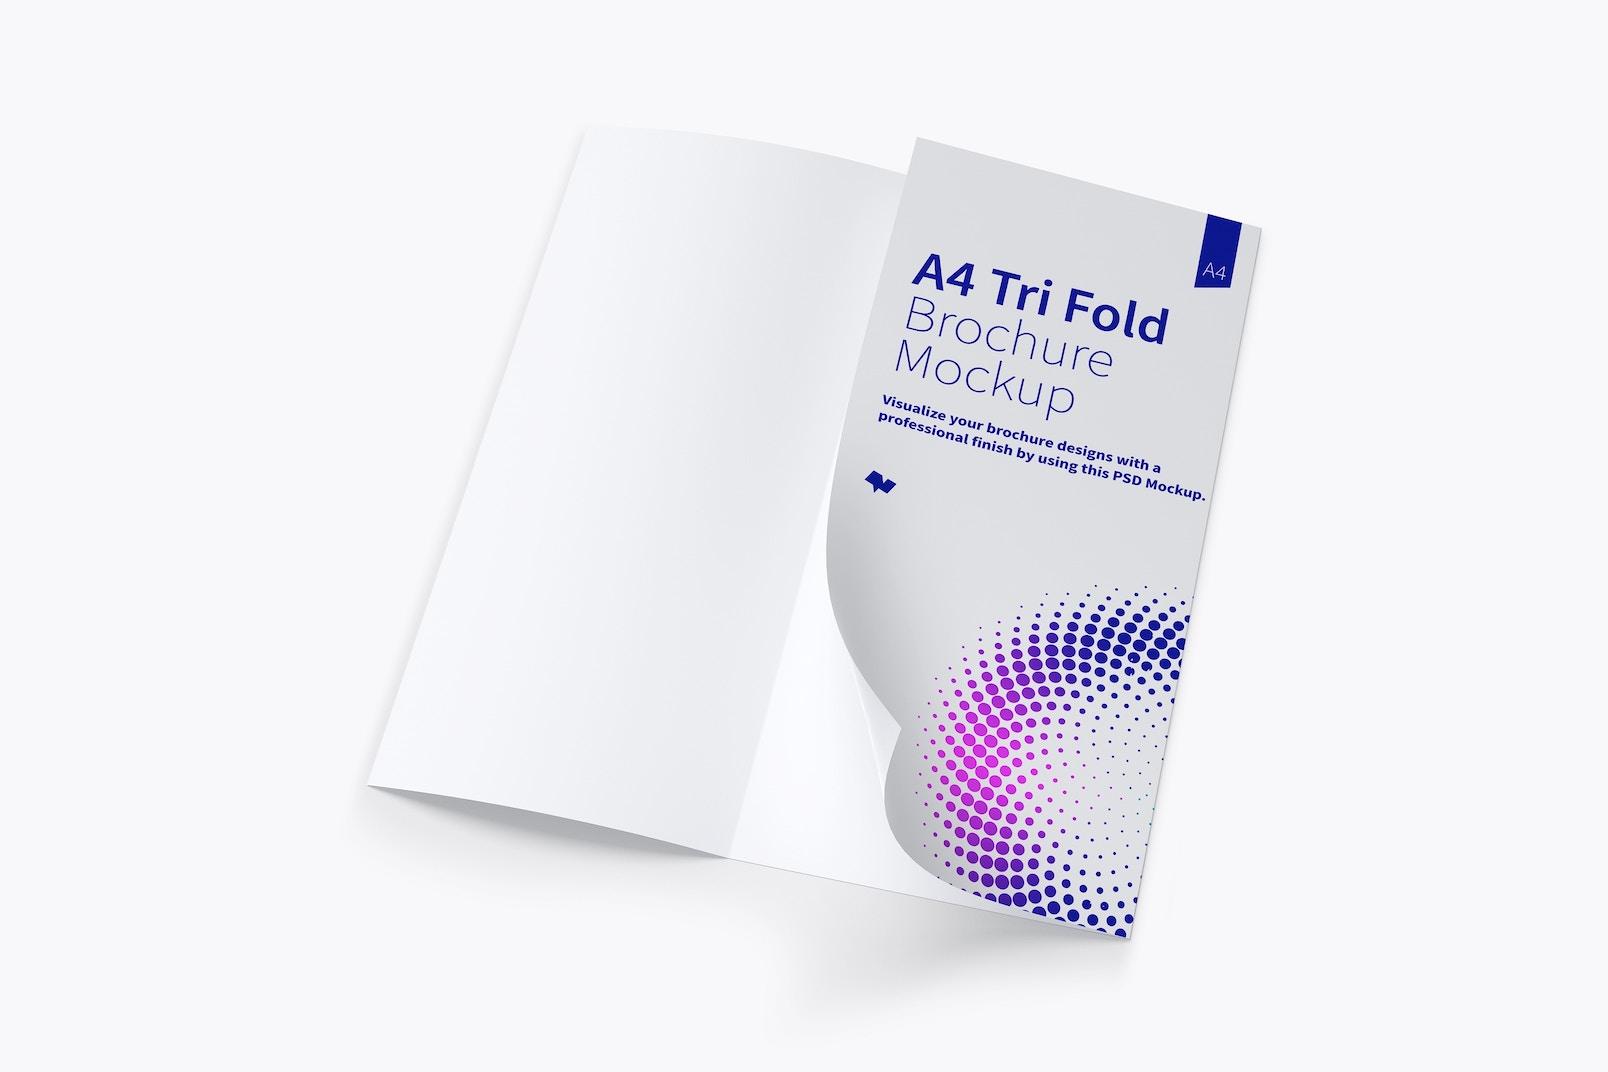 A4 Trifold Brochure Mockup 04